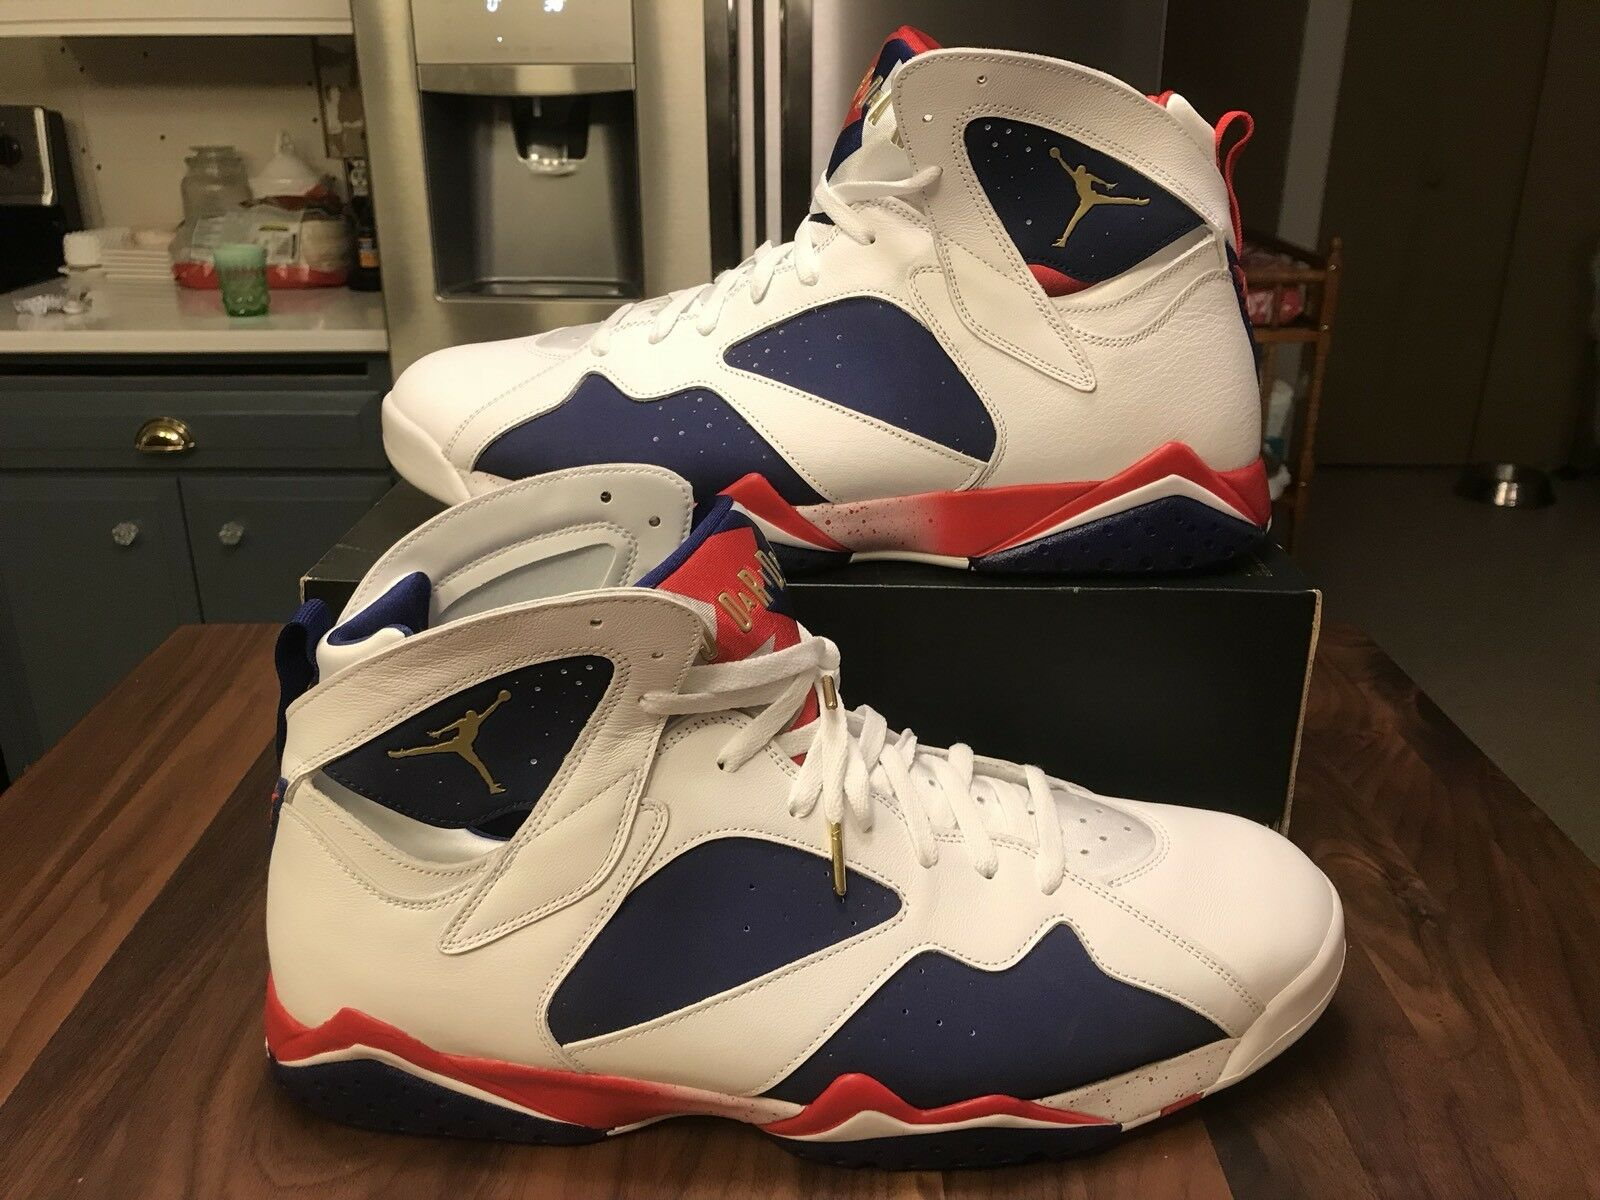 540e478a0fbe9 Nike Air Jordan 7 Retro Tinker Alternate Olympic Size 12 NWB 304775 ...